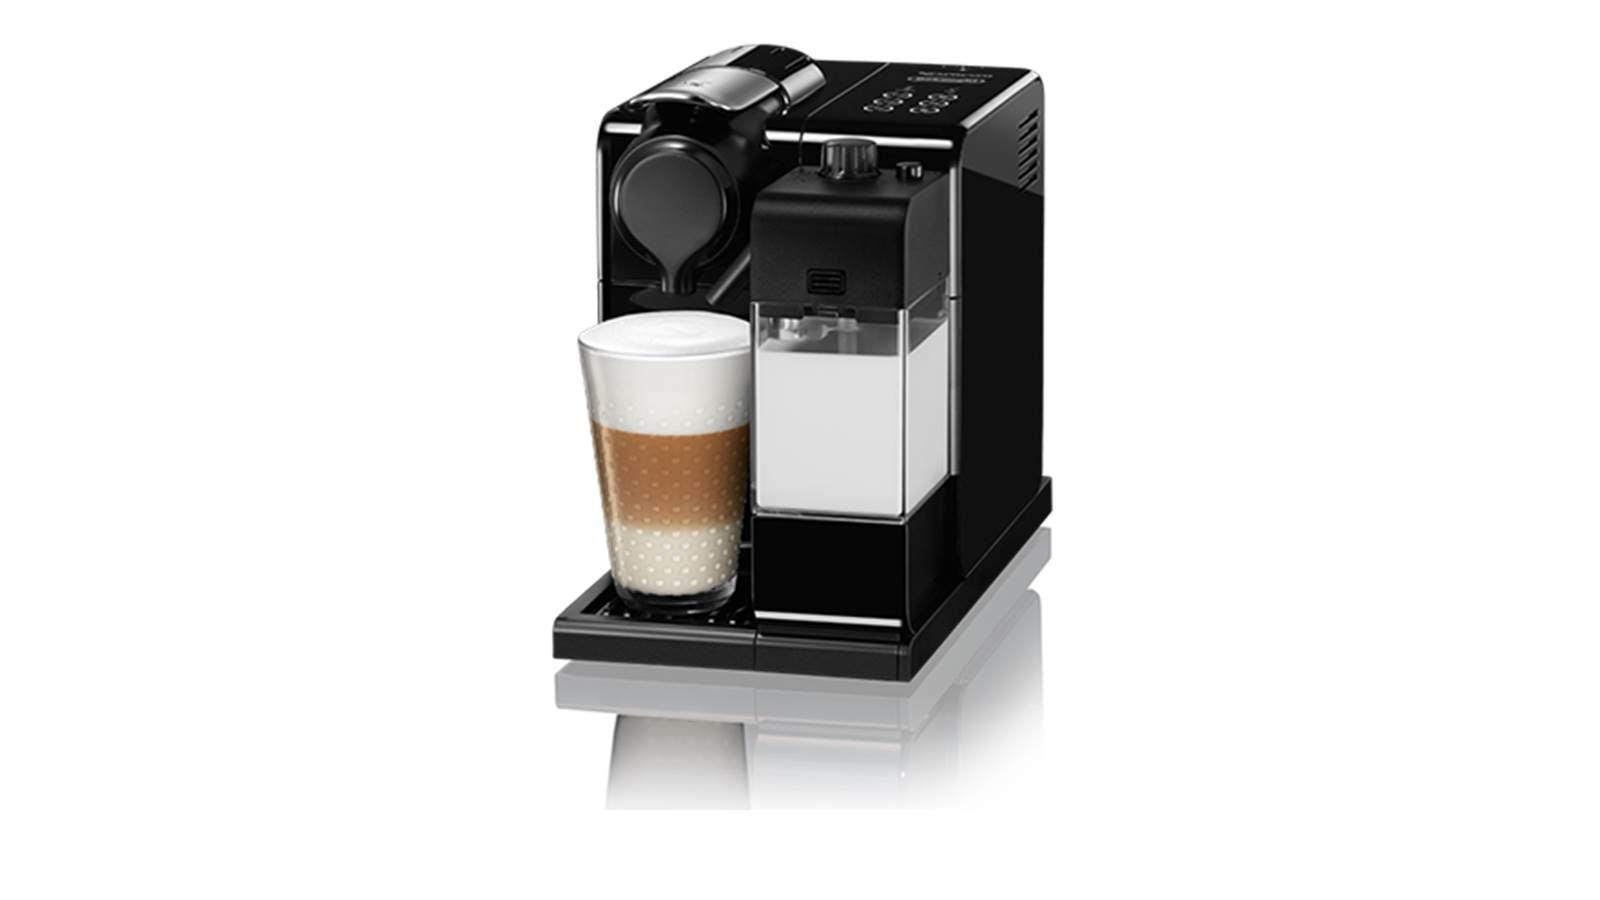 nespresso lattissima one touch coffee machine harvey norman malaysia. Black Bedroom Furniture Sets. Home Design Ideas